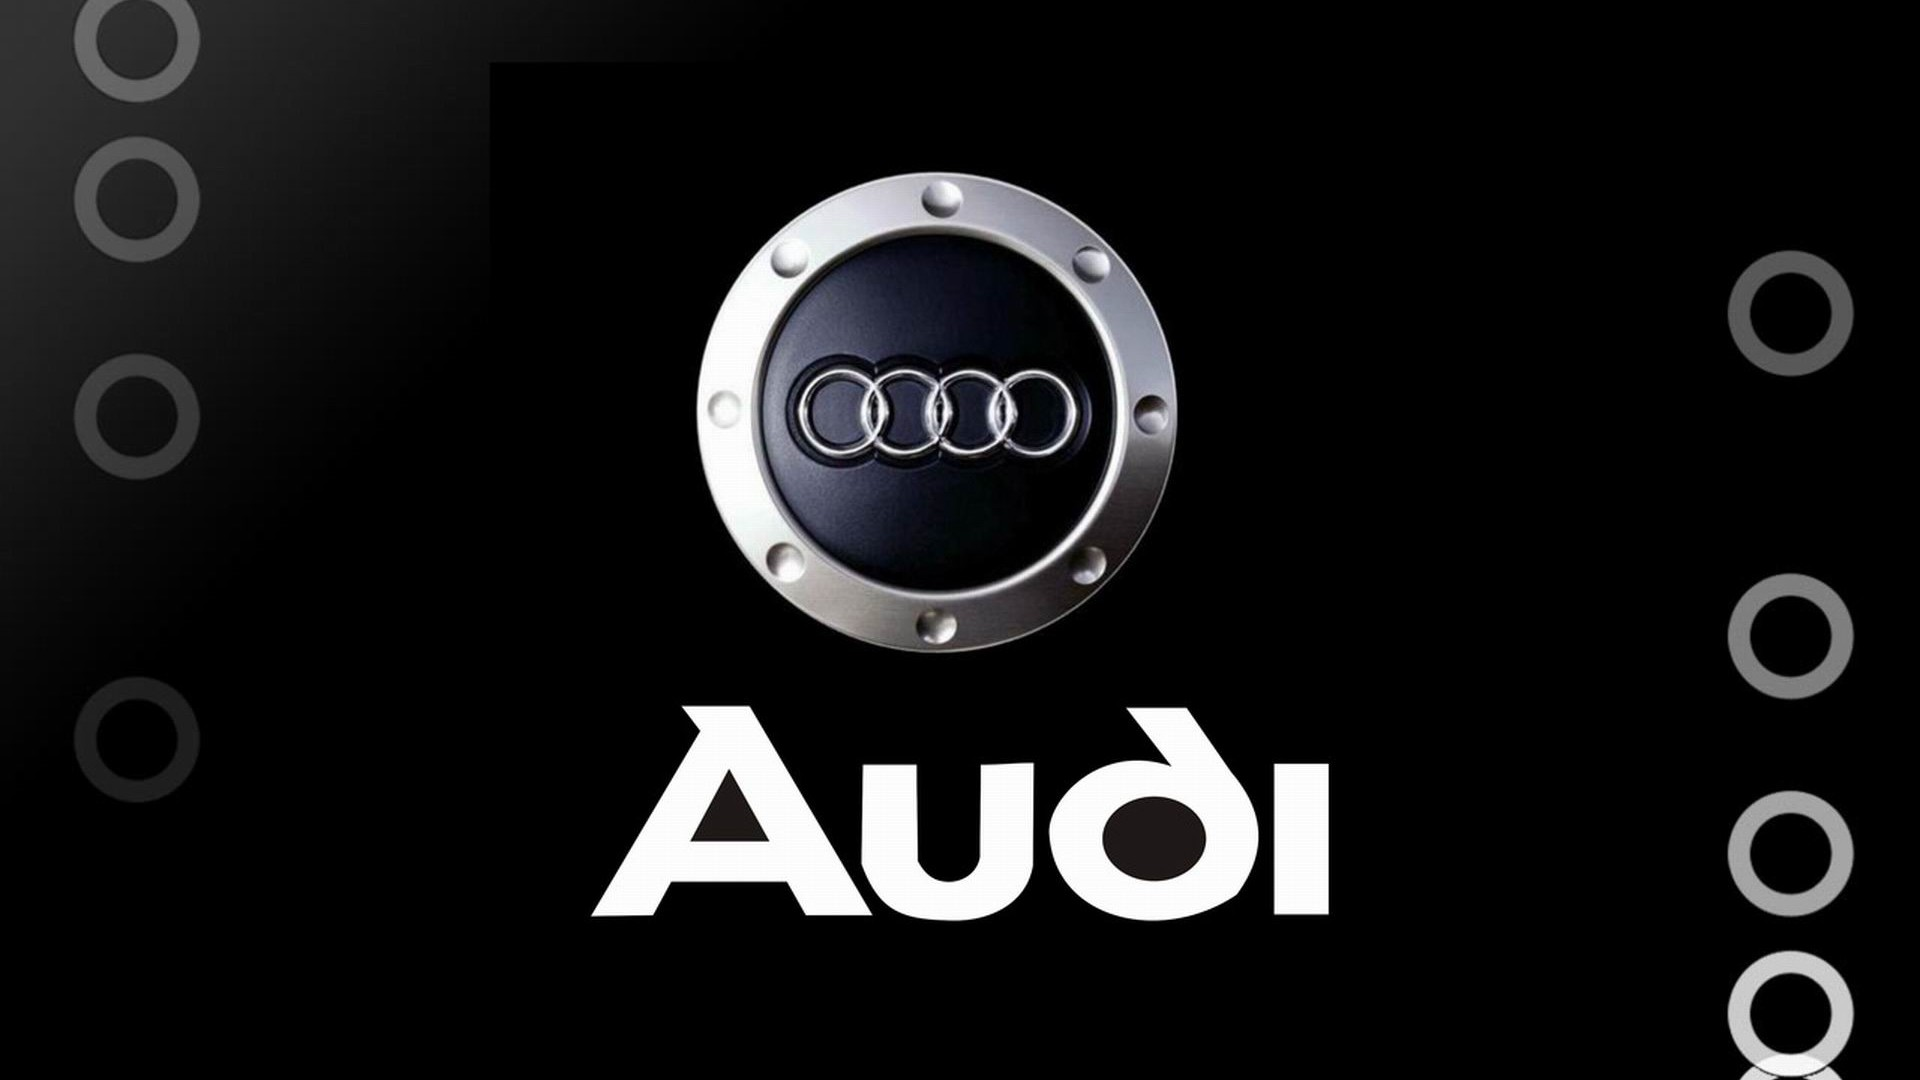 Audi Brand Logo Design Background HD Wallpaper Design 1920x1080